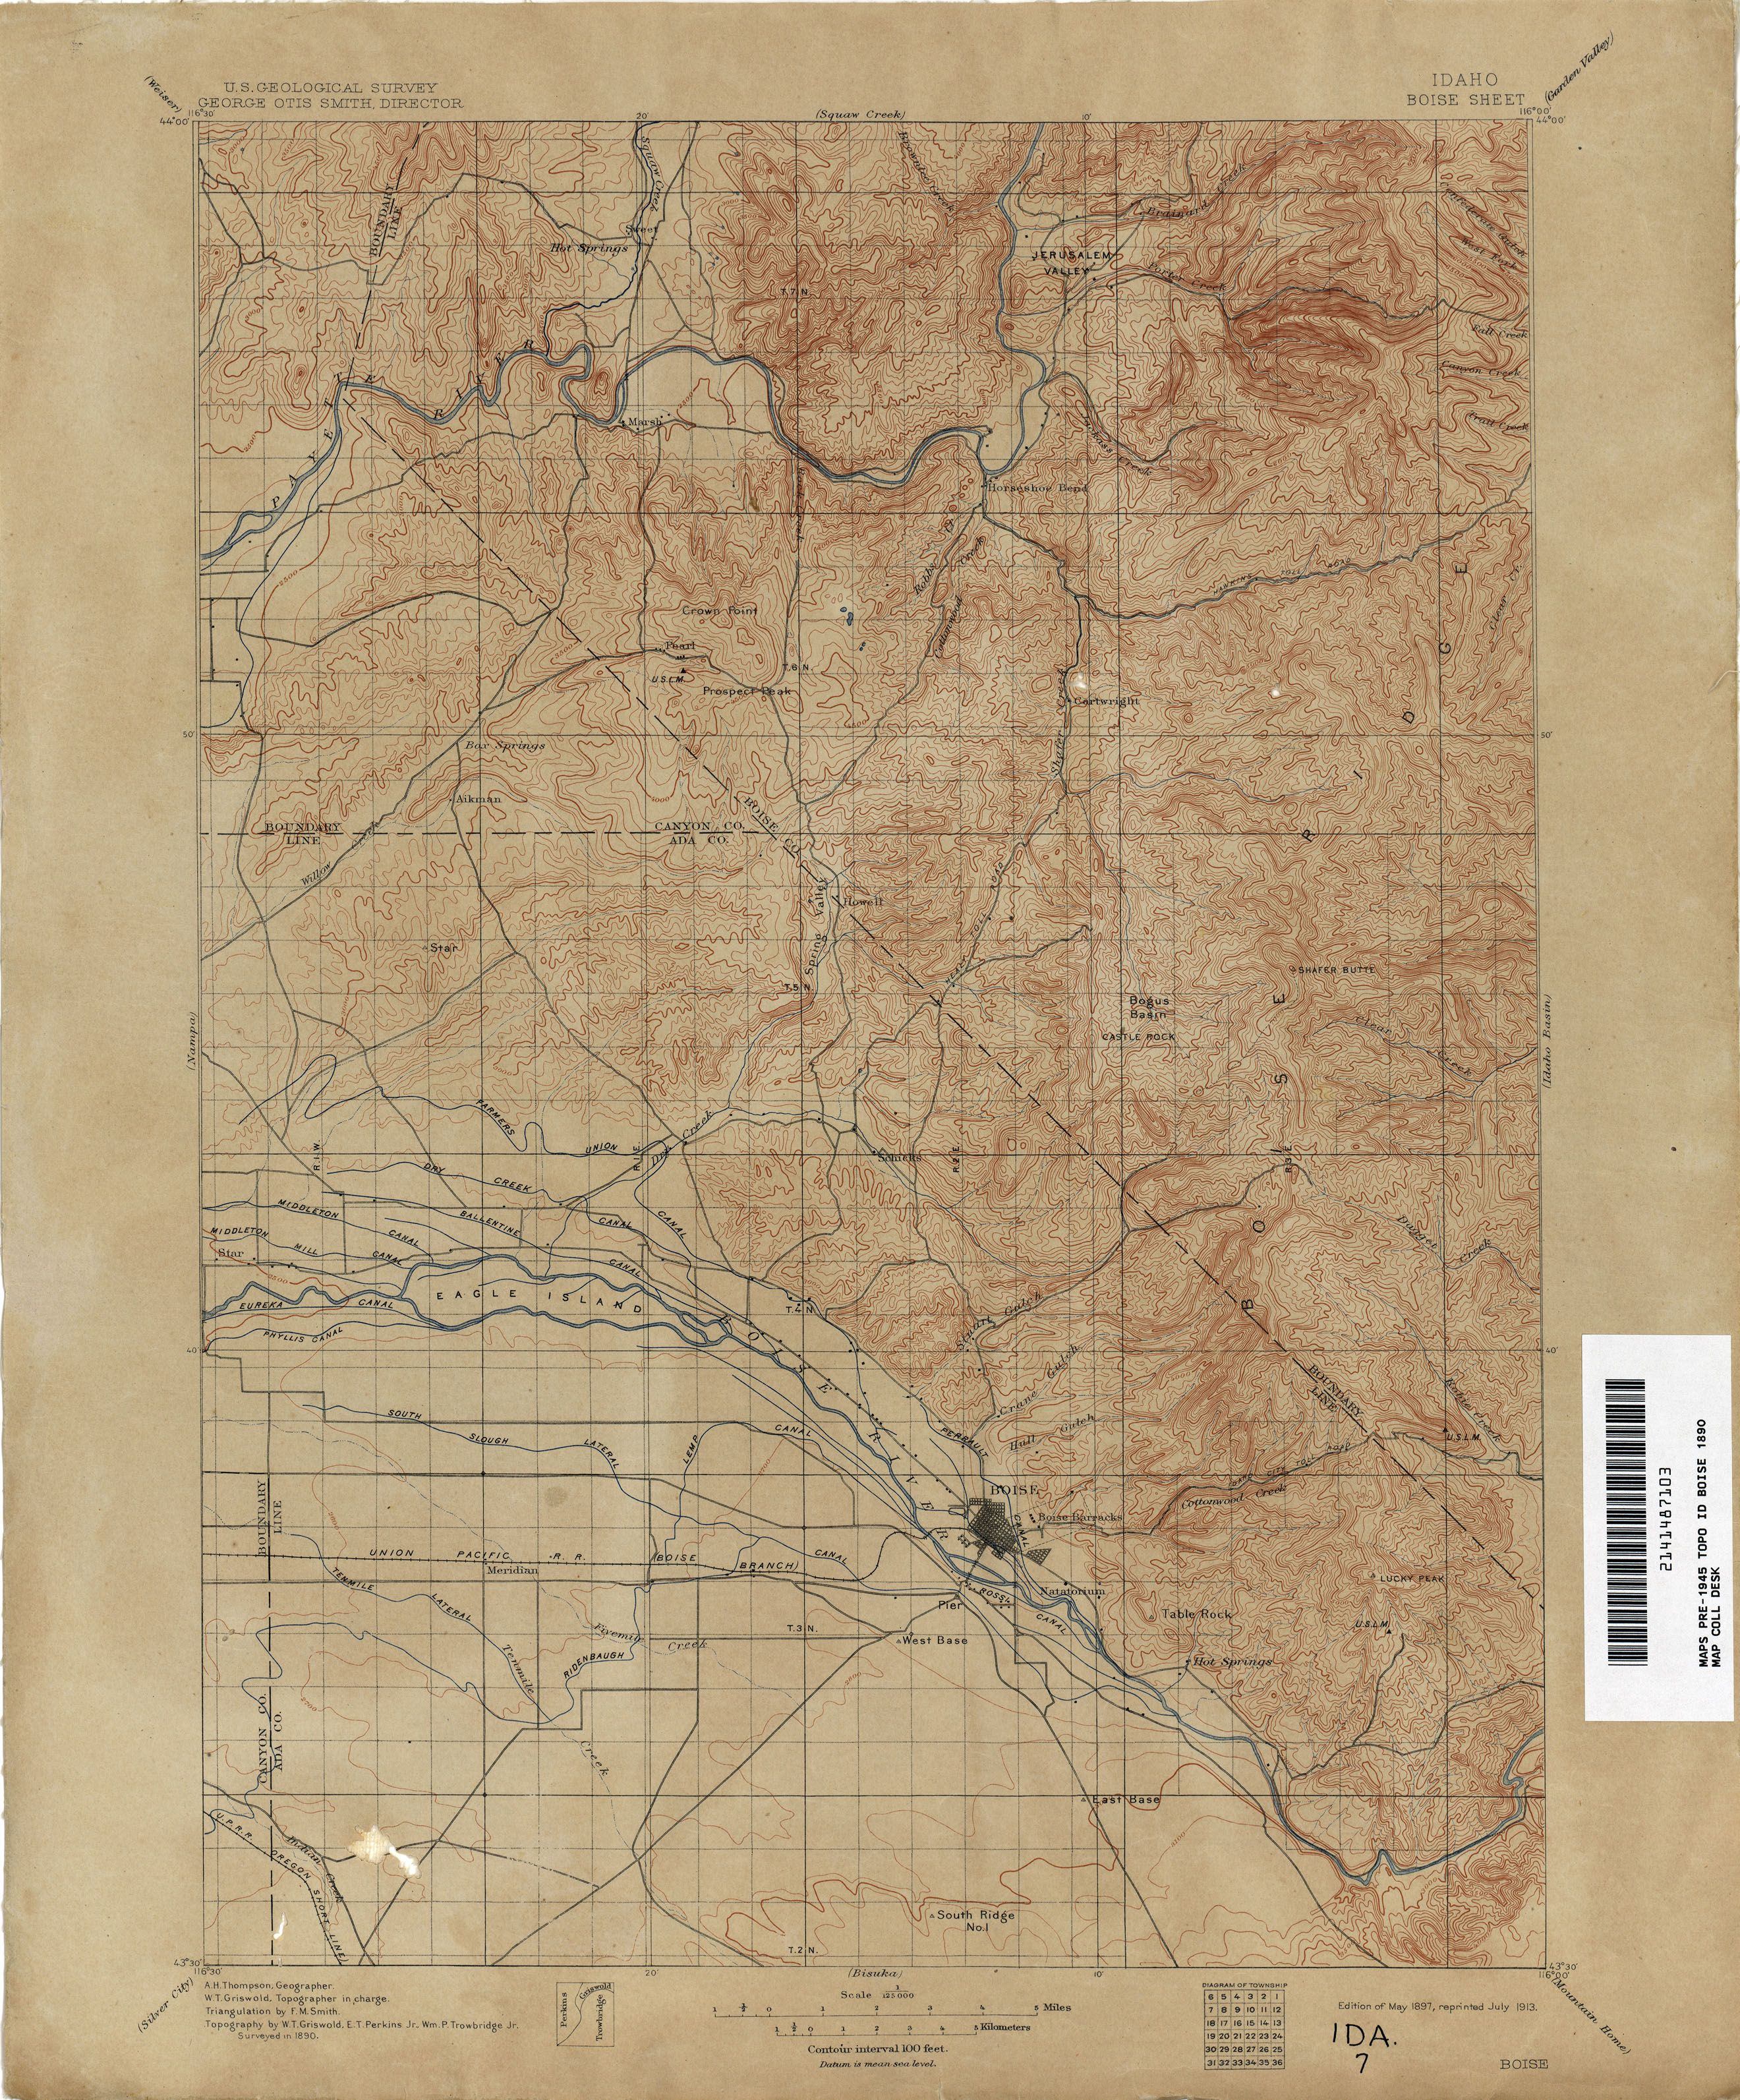 Boise Idaho Topo Map Circa 1890 Idaho Became A State On July 3